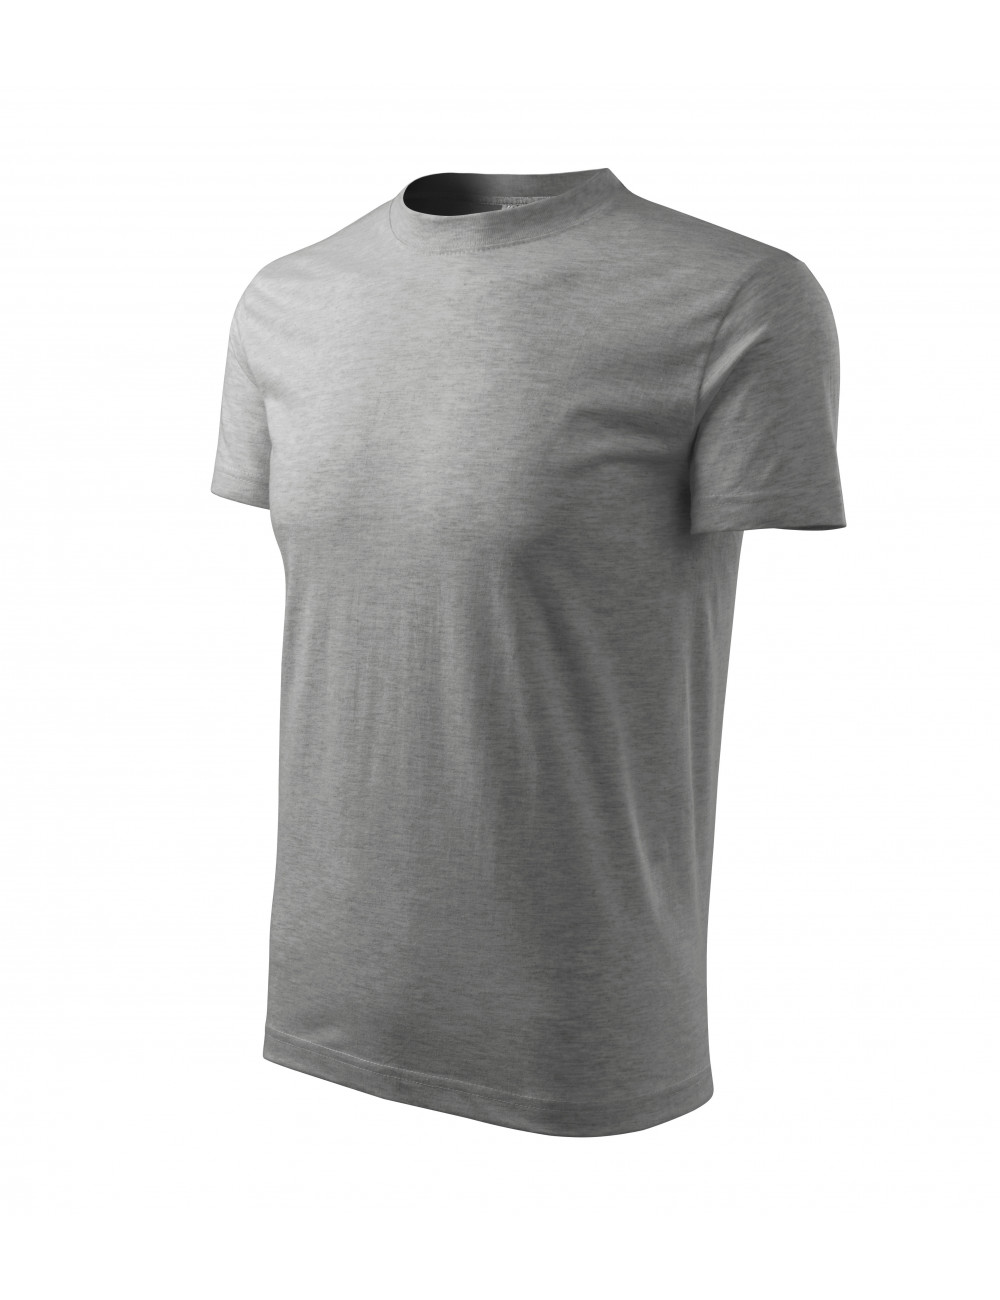 Adler MALFINI Koszulka unisex Classic 101 ciemnoszary melanż